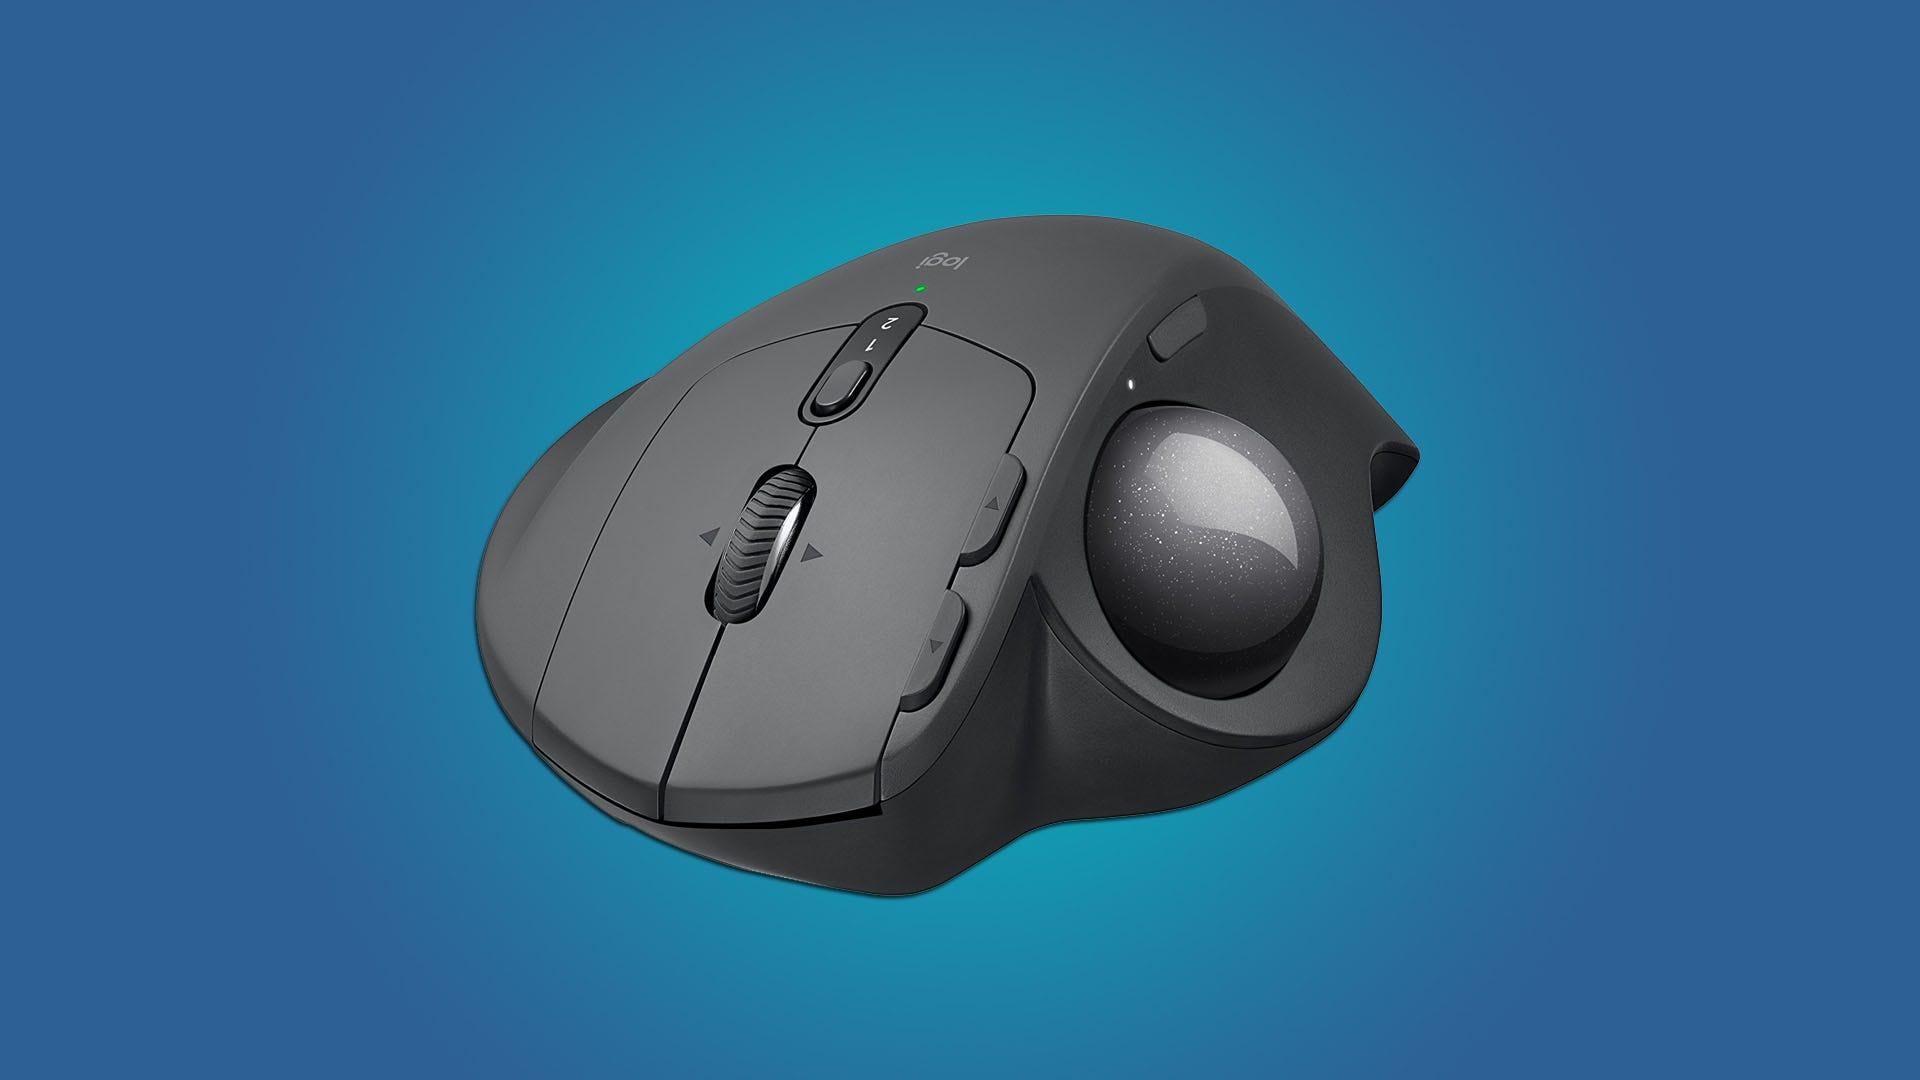 Logitech Ergo MX trackball mouse on a blue gradient background